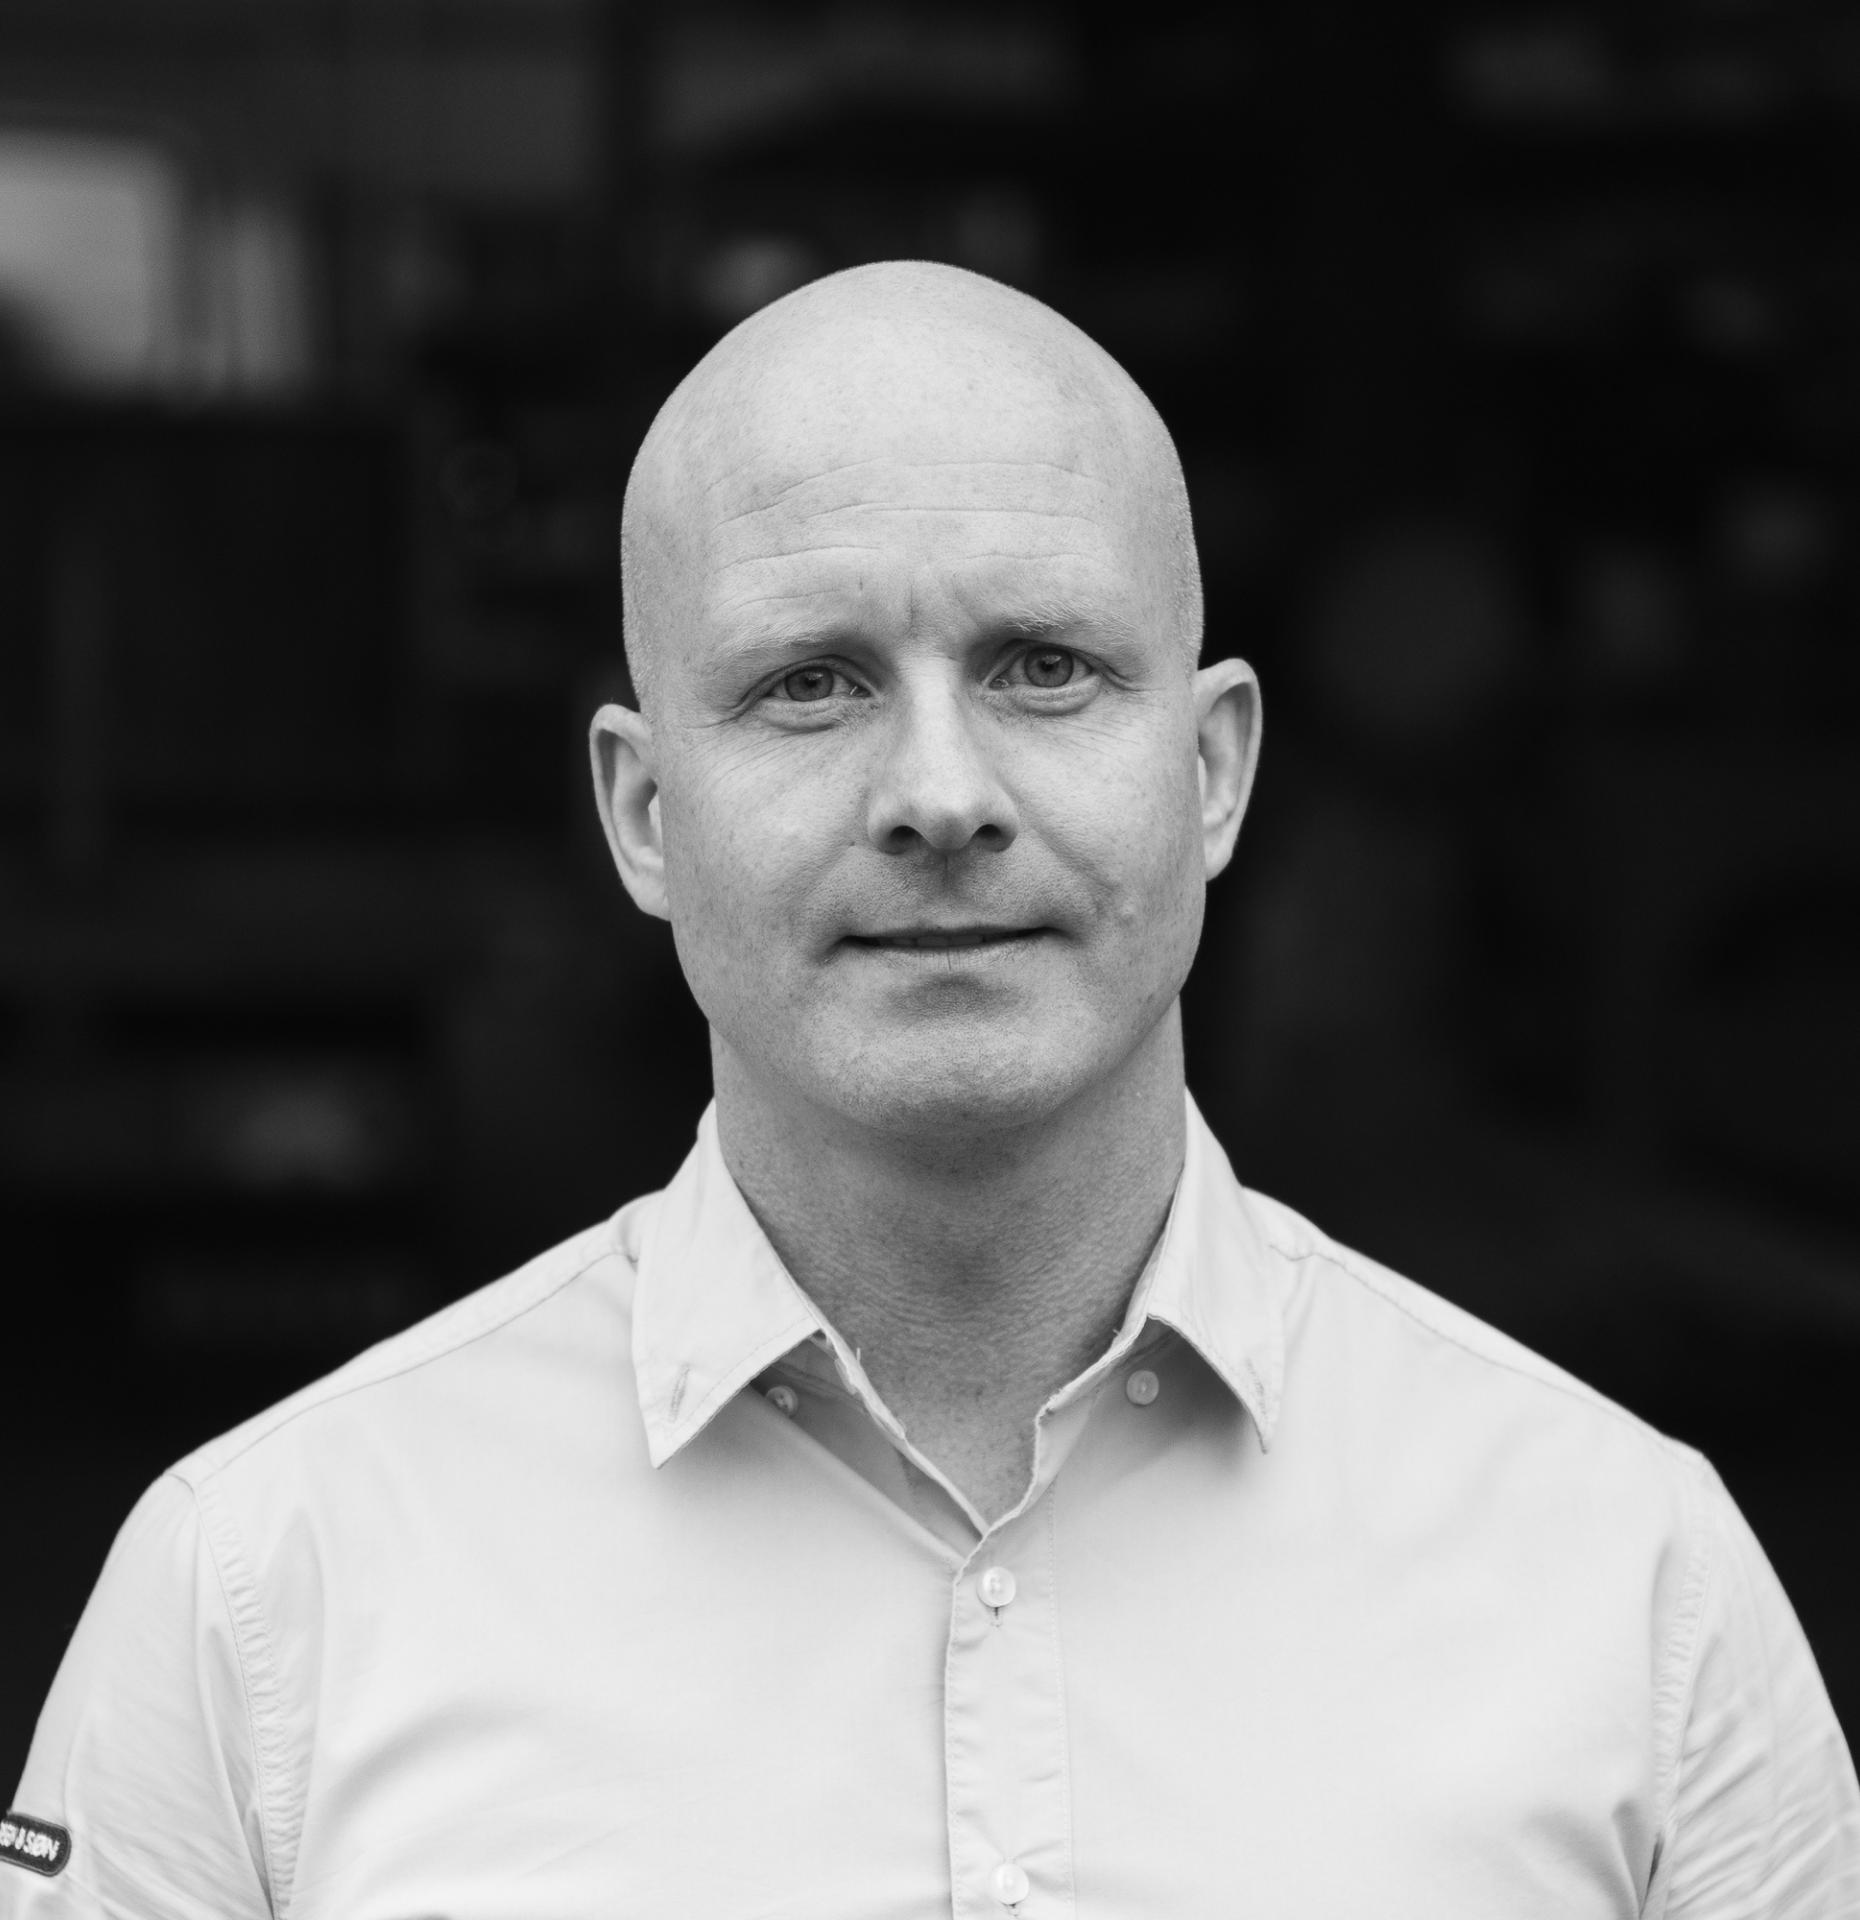 COO Peter Birkmann, Erik Larsen & Søn